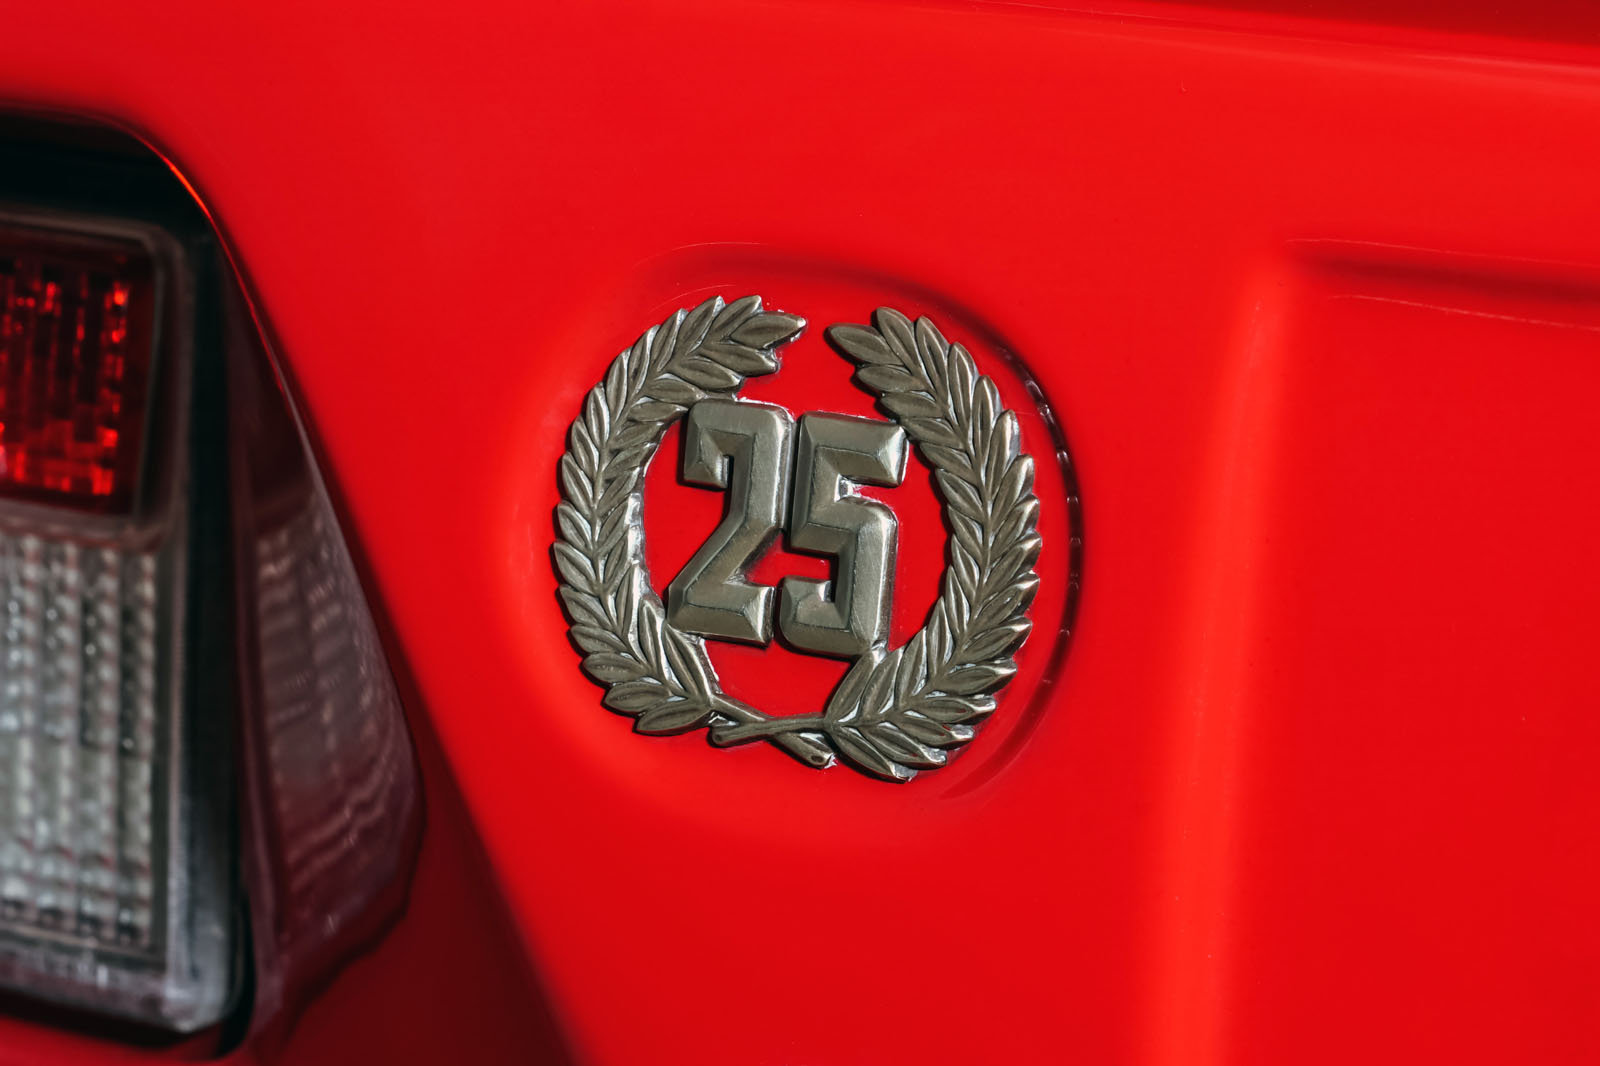 Lamborghini_Countach_Rot_Schwarz_LAM-2811_21_w